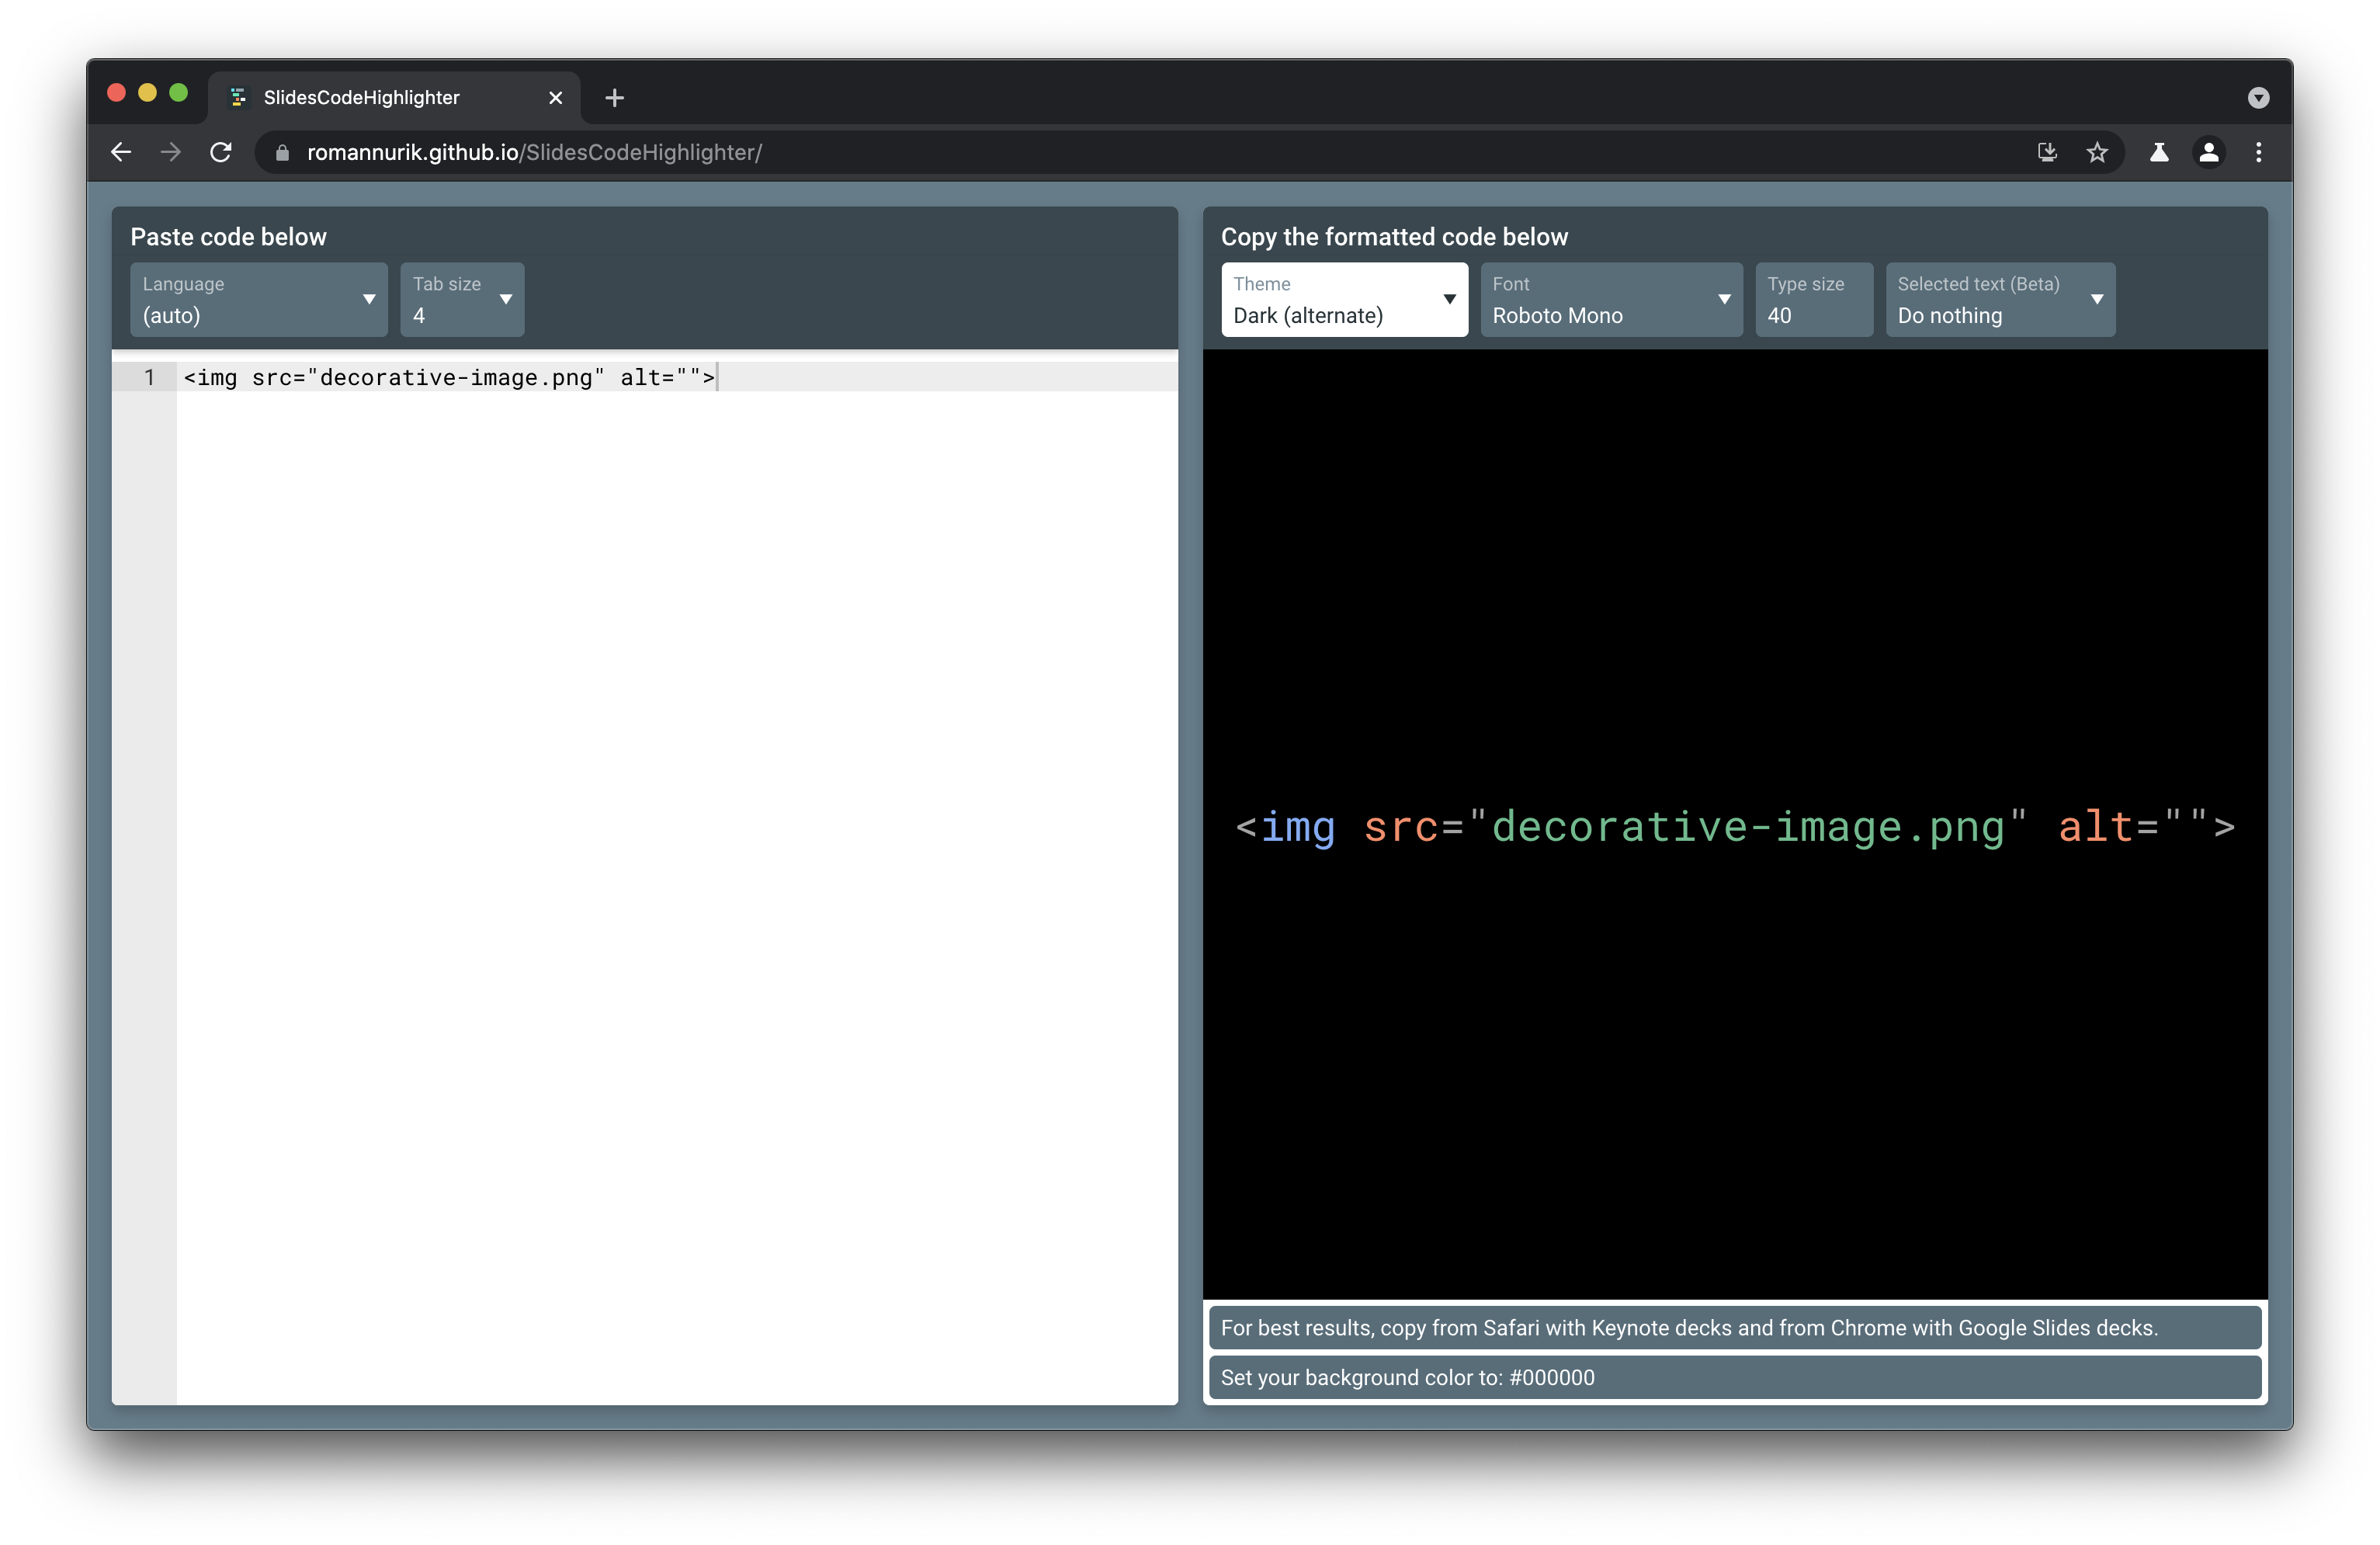 The Slides Code Highlighter Web app